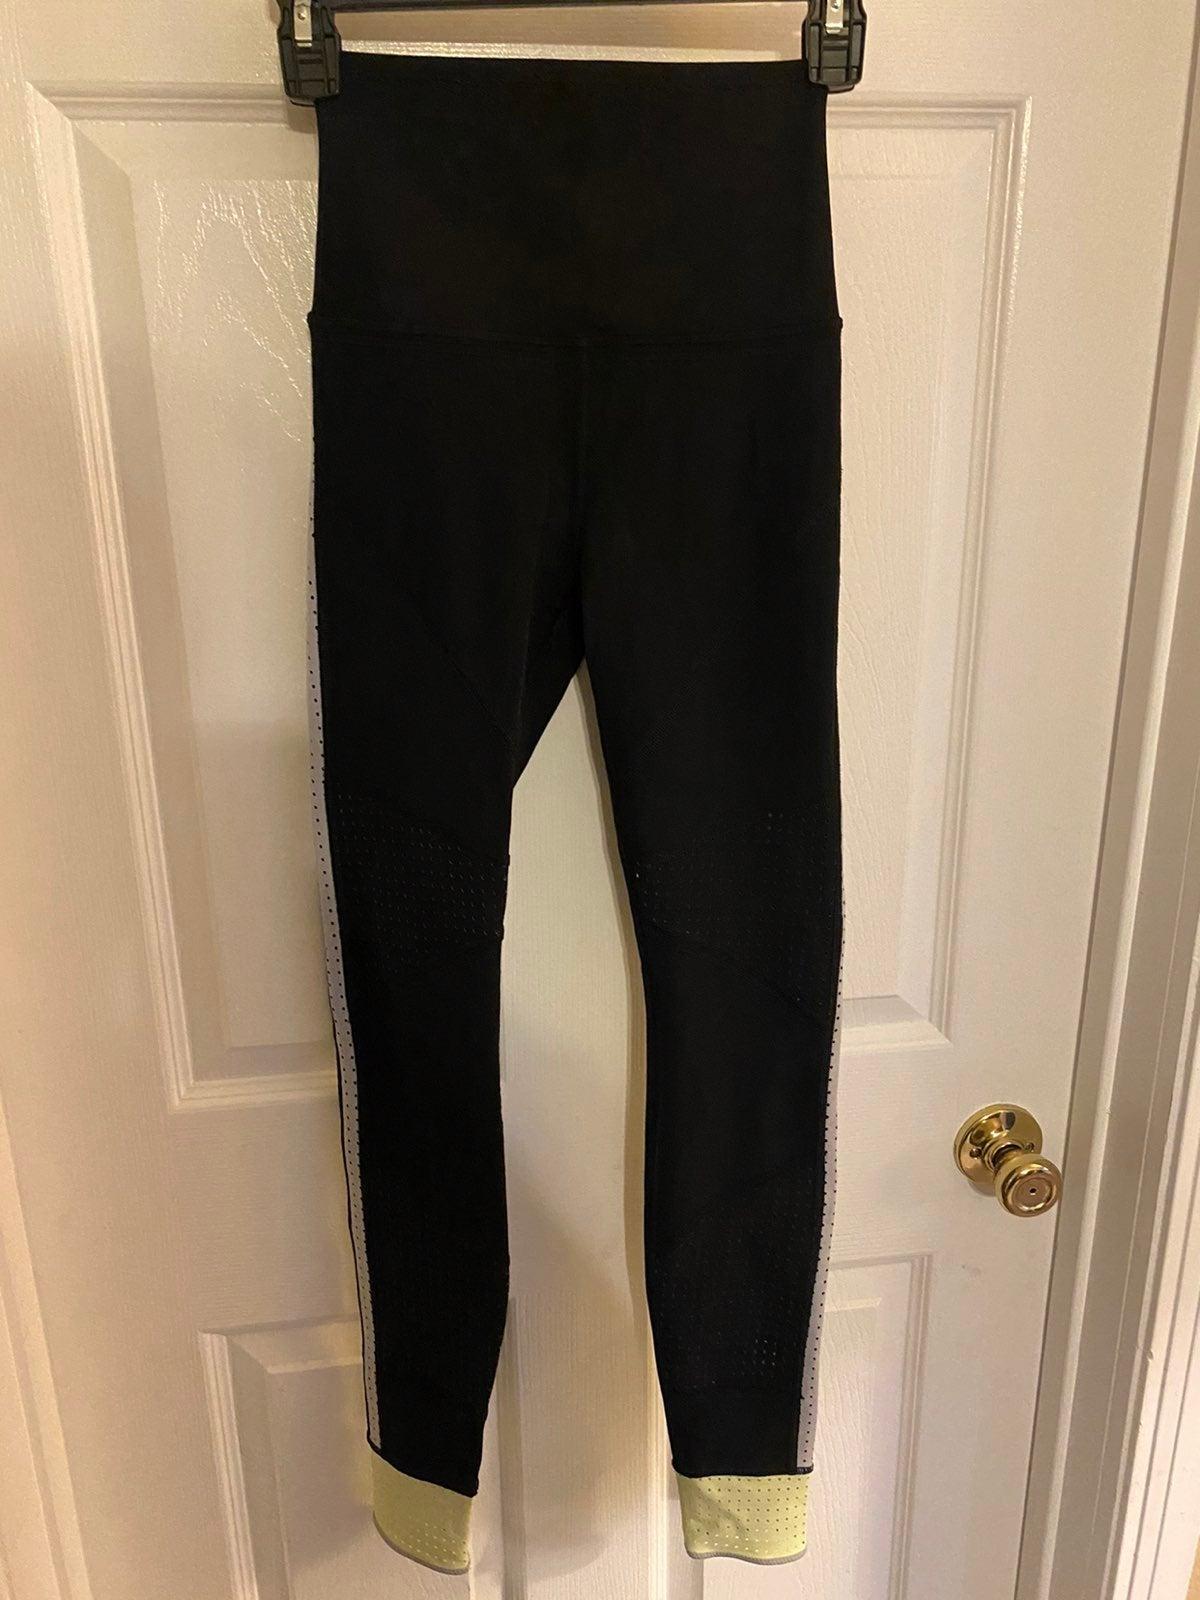 Lululemon sz 6 leggings with zipper